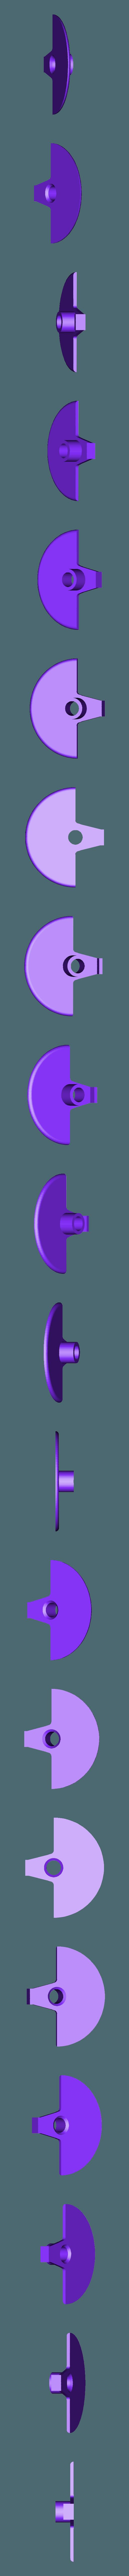 wmy-wheel-pot-04.stl Download free STL file MX MIDI Guitar • 3D print model, Adafruit